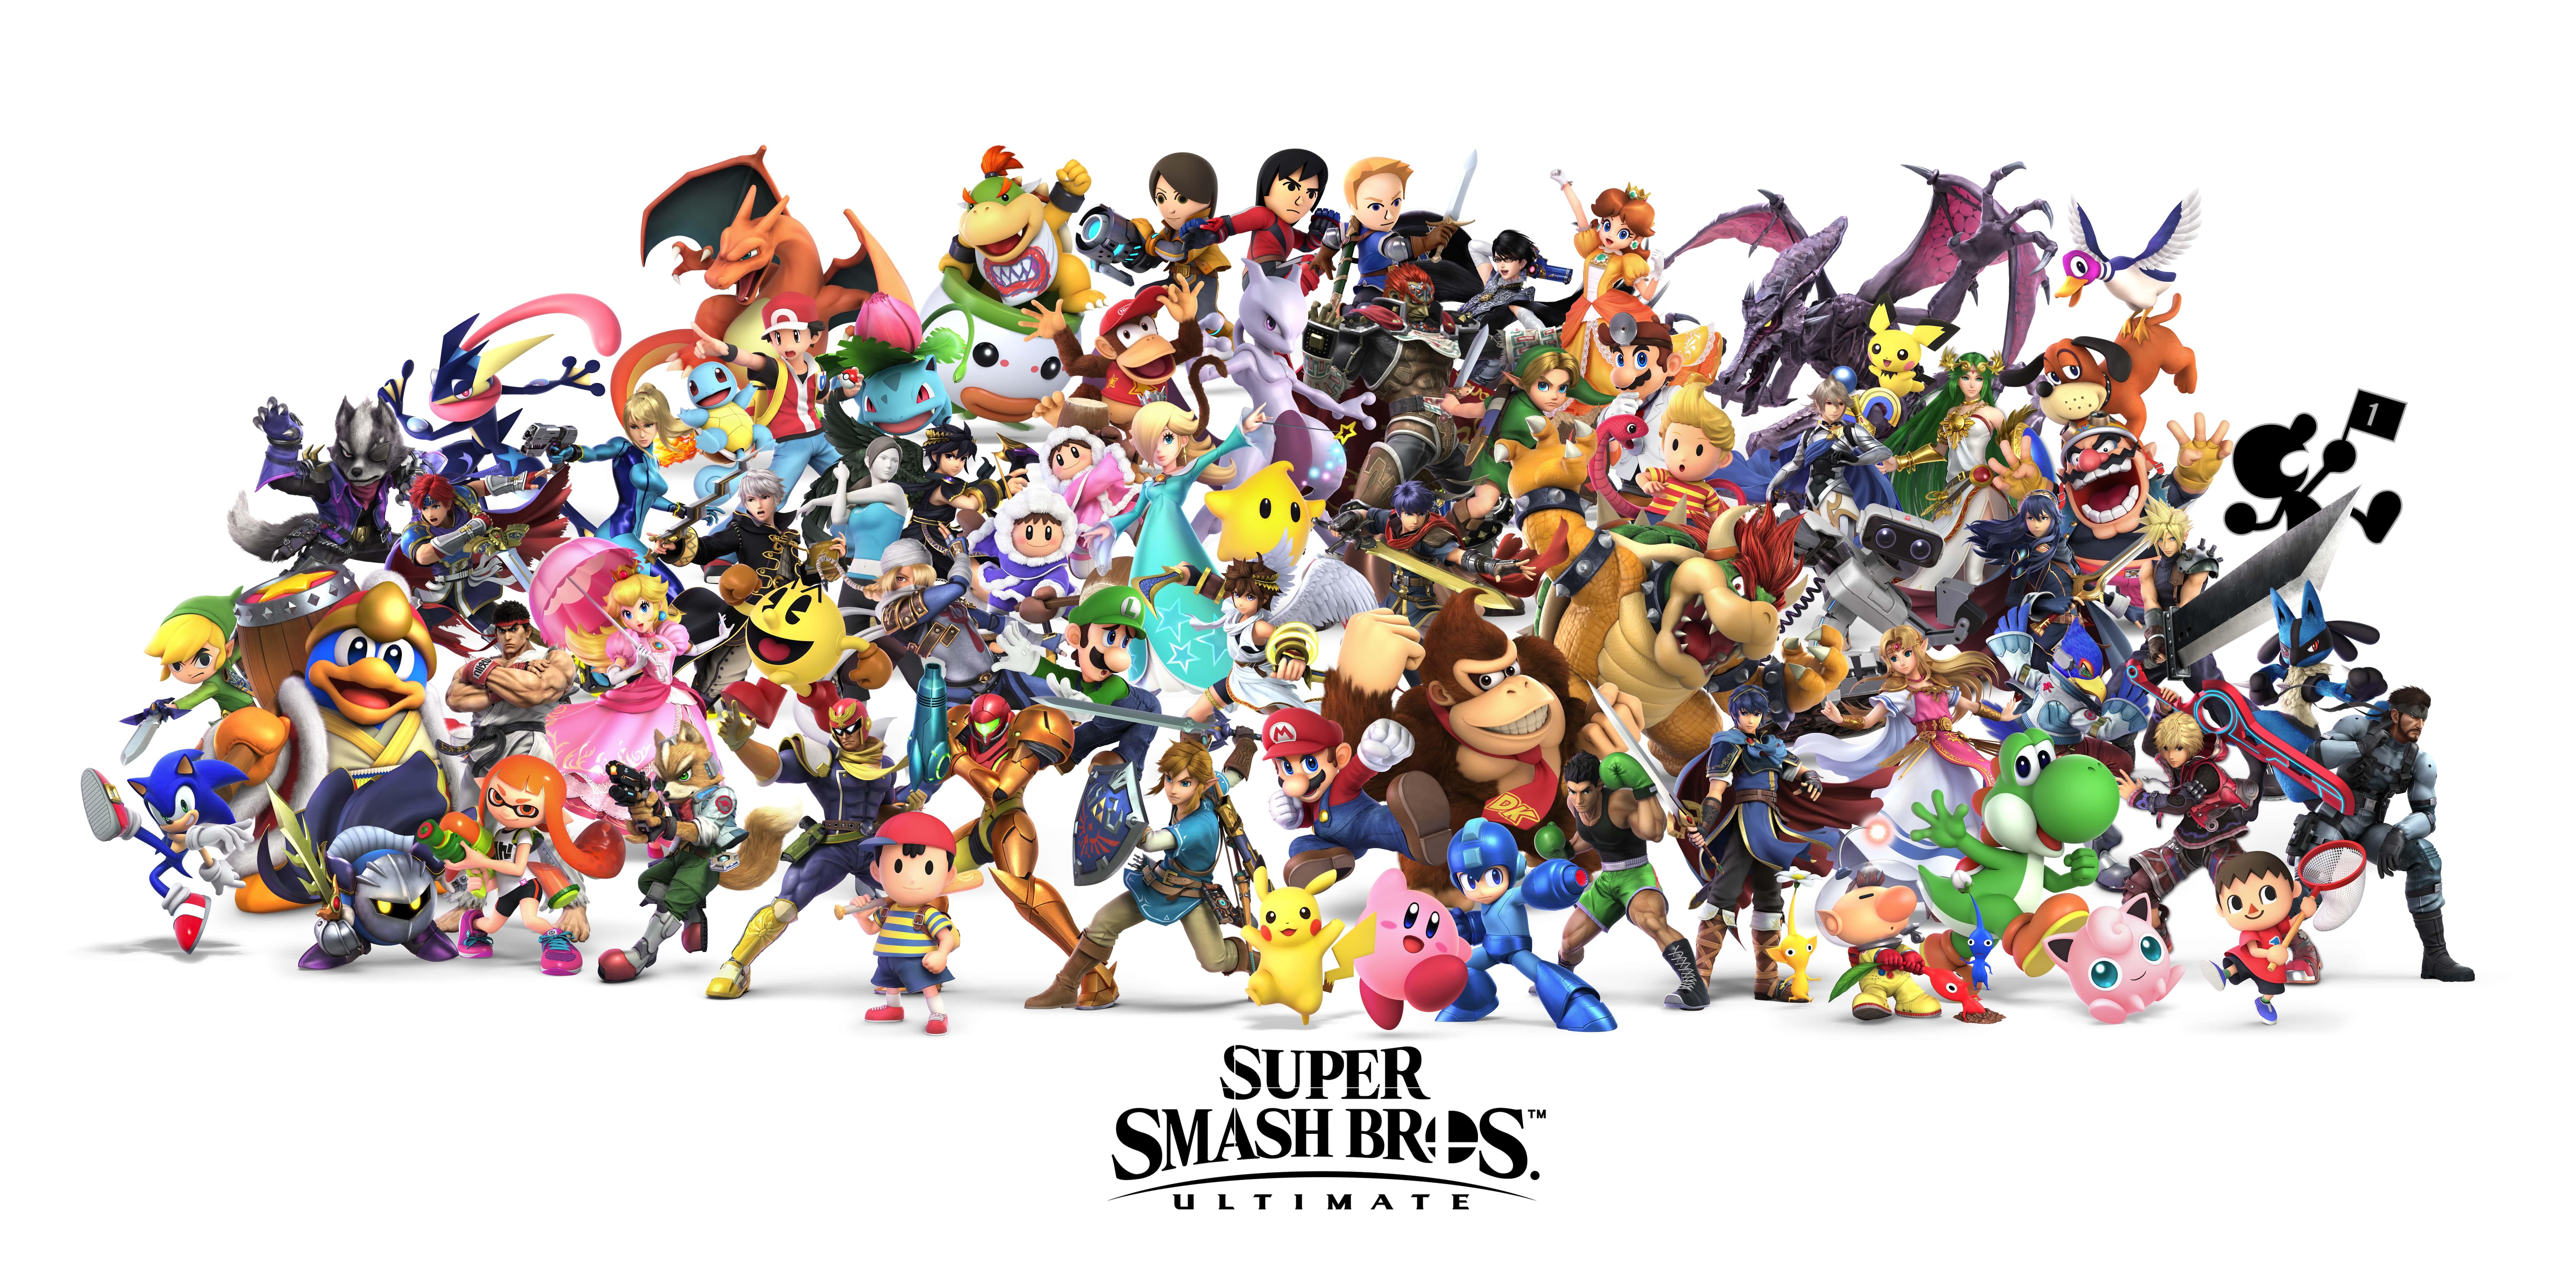 Video Game 9k Wallpaper Super Smash Bros Ultimate 4214 Wallpapers 9272x4587